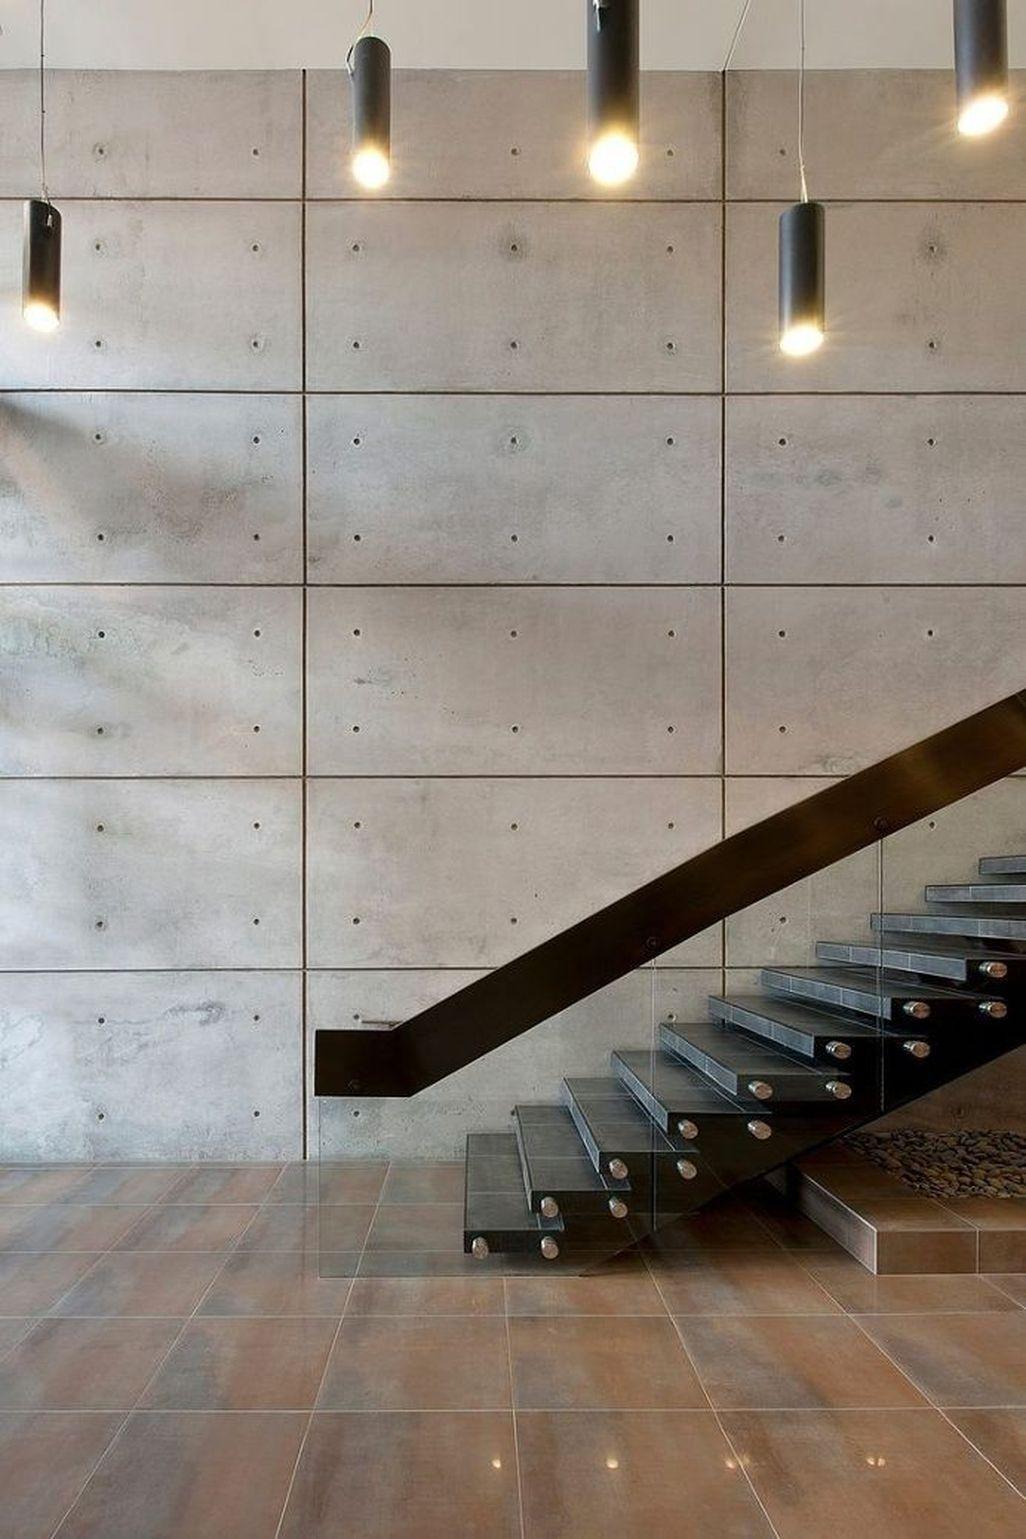 Pin By Yudi Wahyudi On Stairs Concrete Interiors Concrete Walls Interior Interior Architecture Design